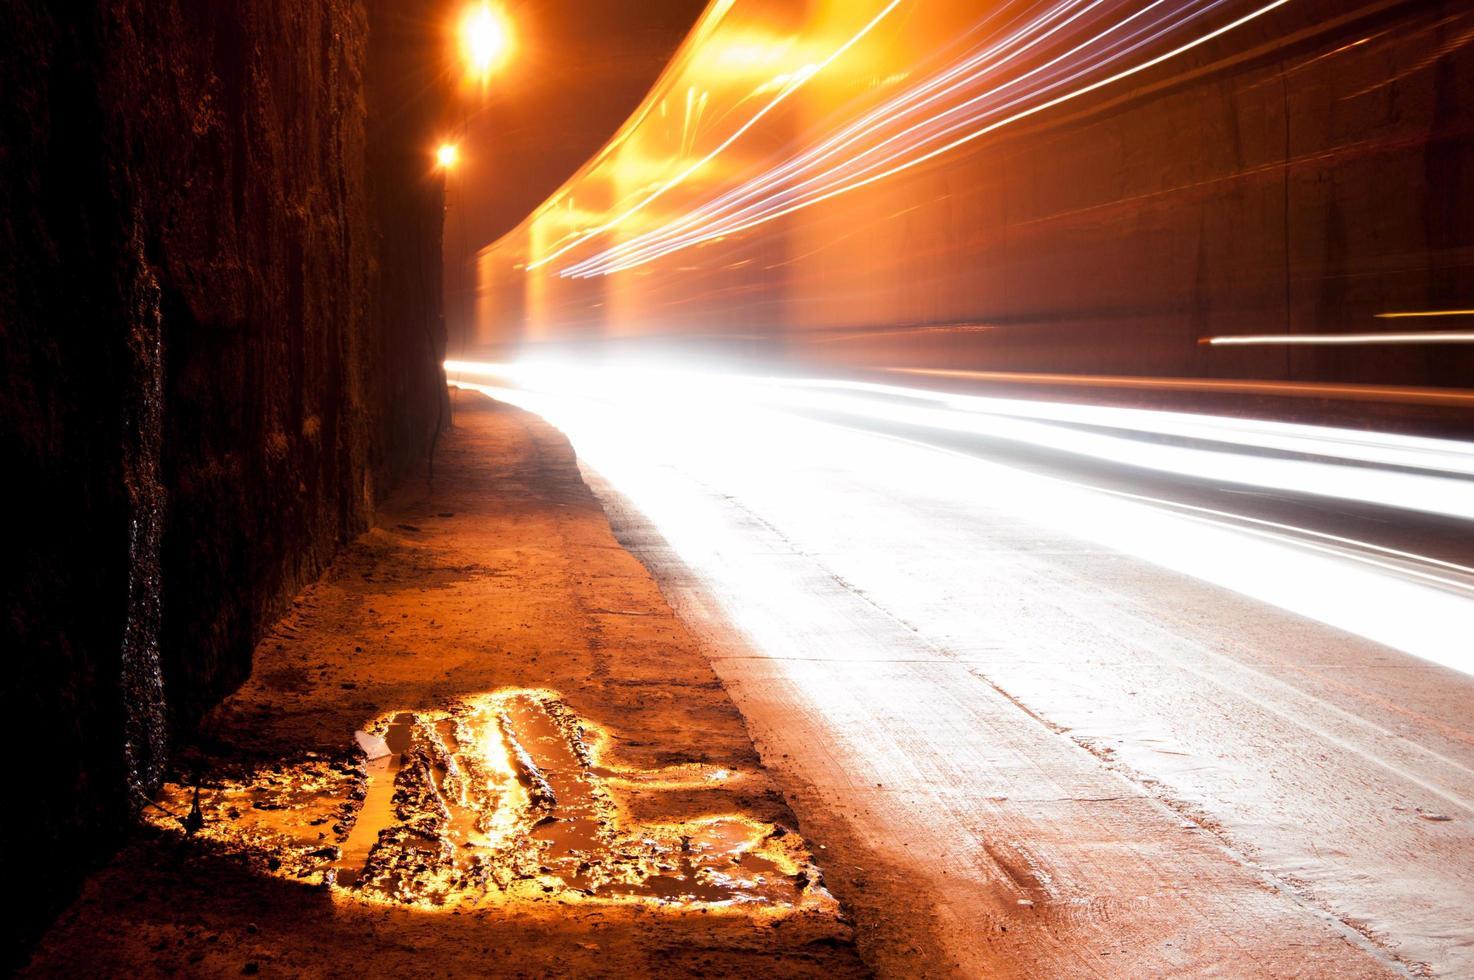 un tunnel buio con scie luminose foto